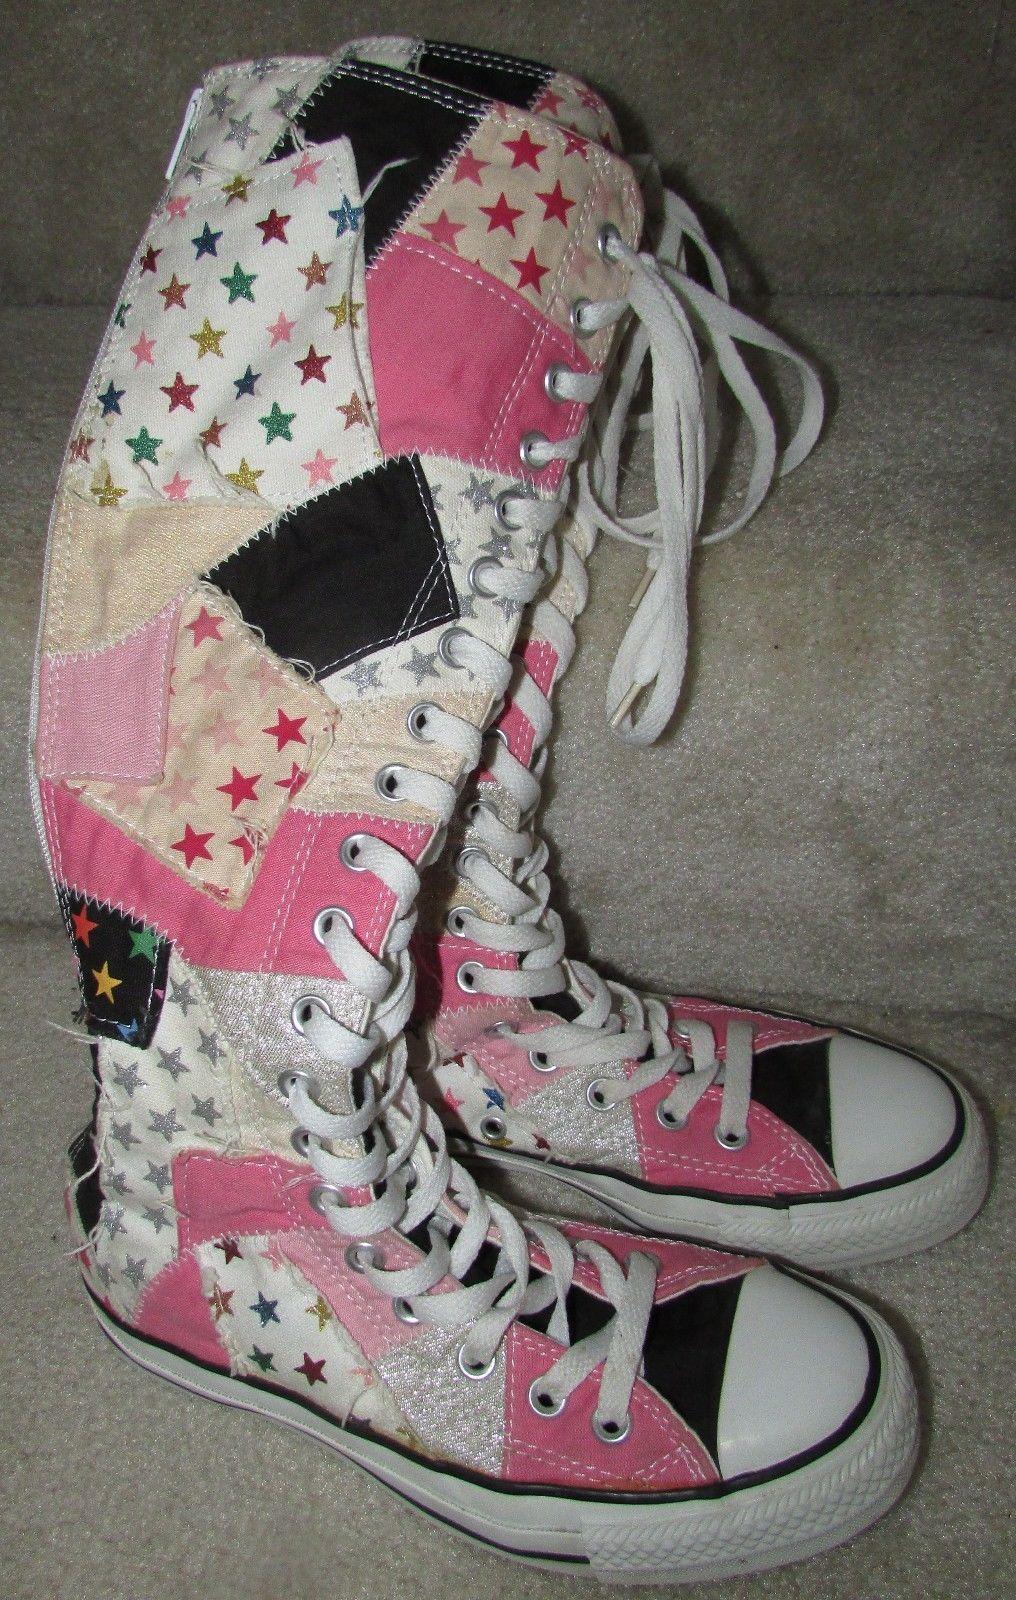 a5e955e570f Converse All Star Chuck Taylor Knee High Patchwork Boot Sneakers Boys 4  Women 6